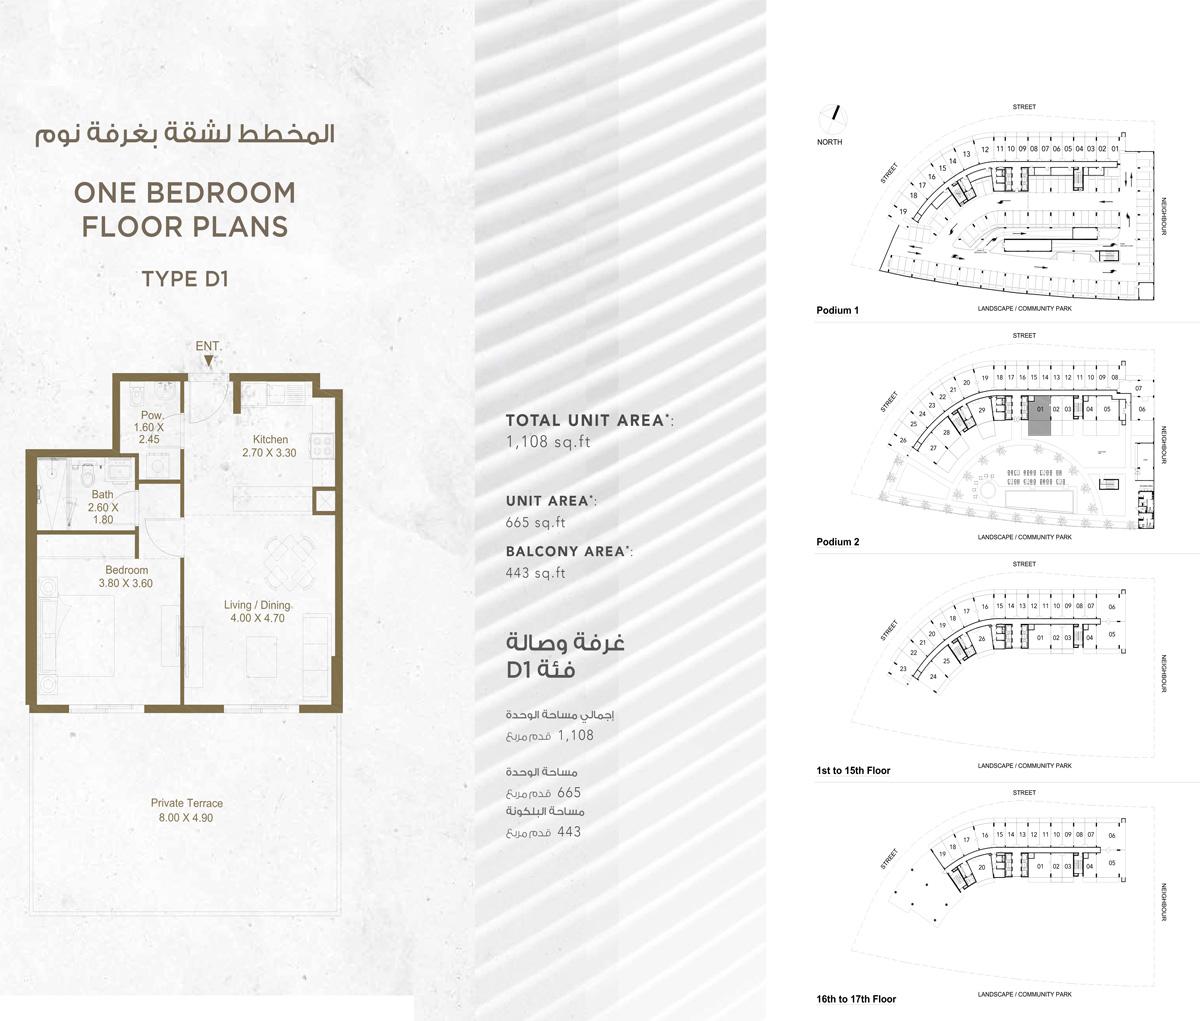 1 Bedroom Type D1, Size 1108 sq.ft